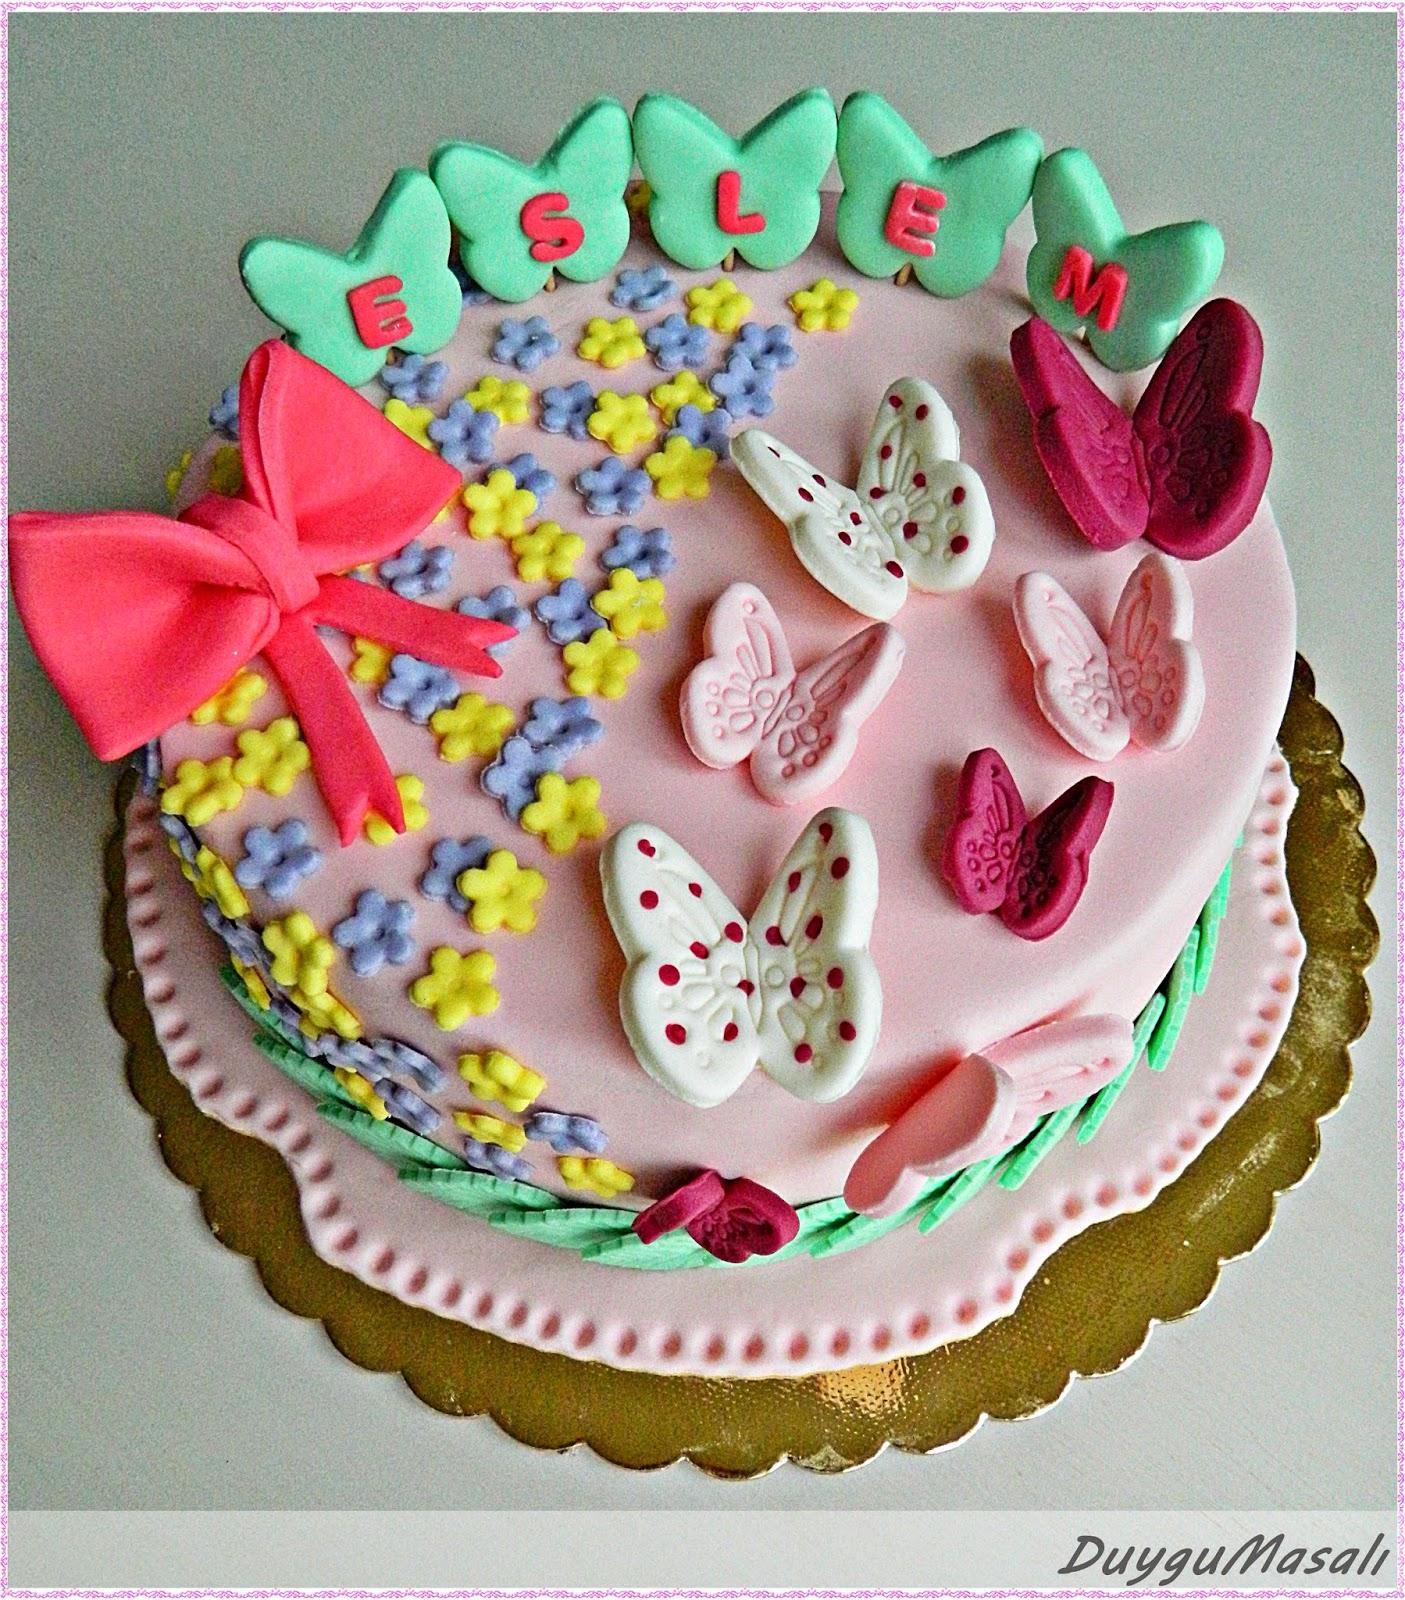 4.yaş doğum günü pastası